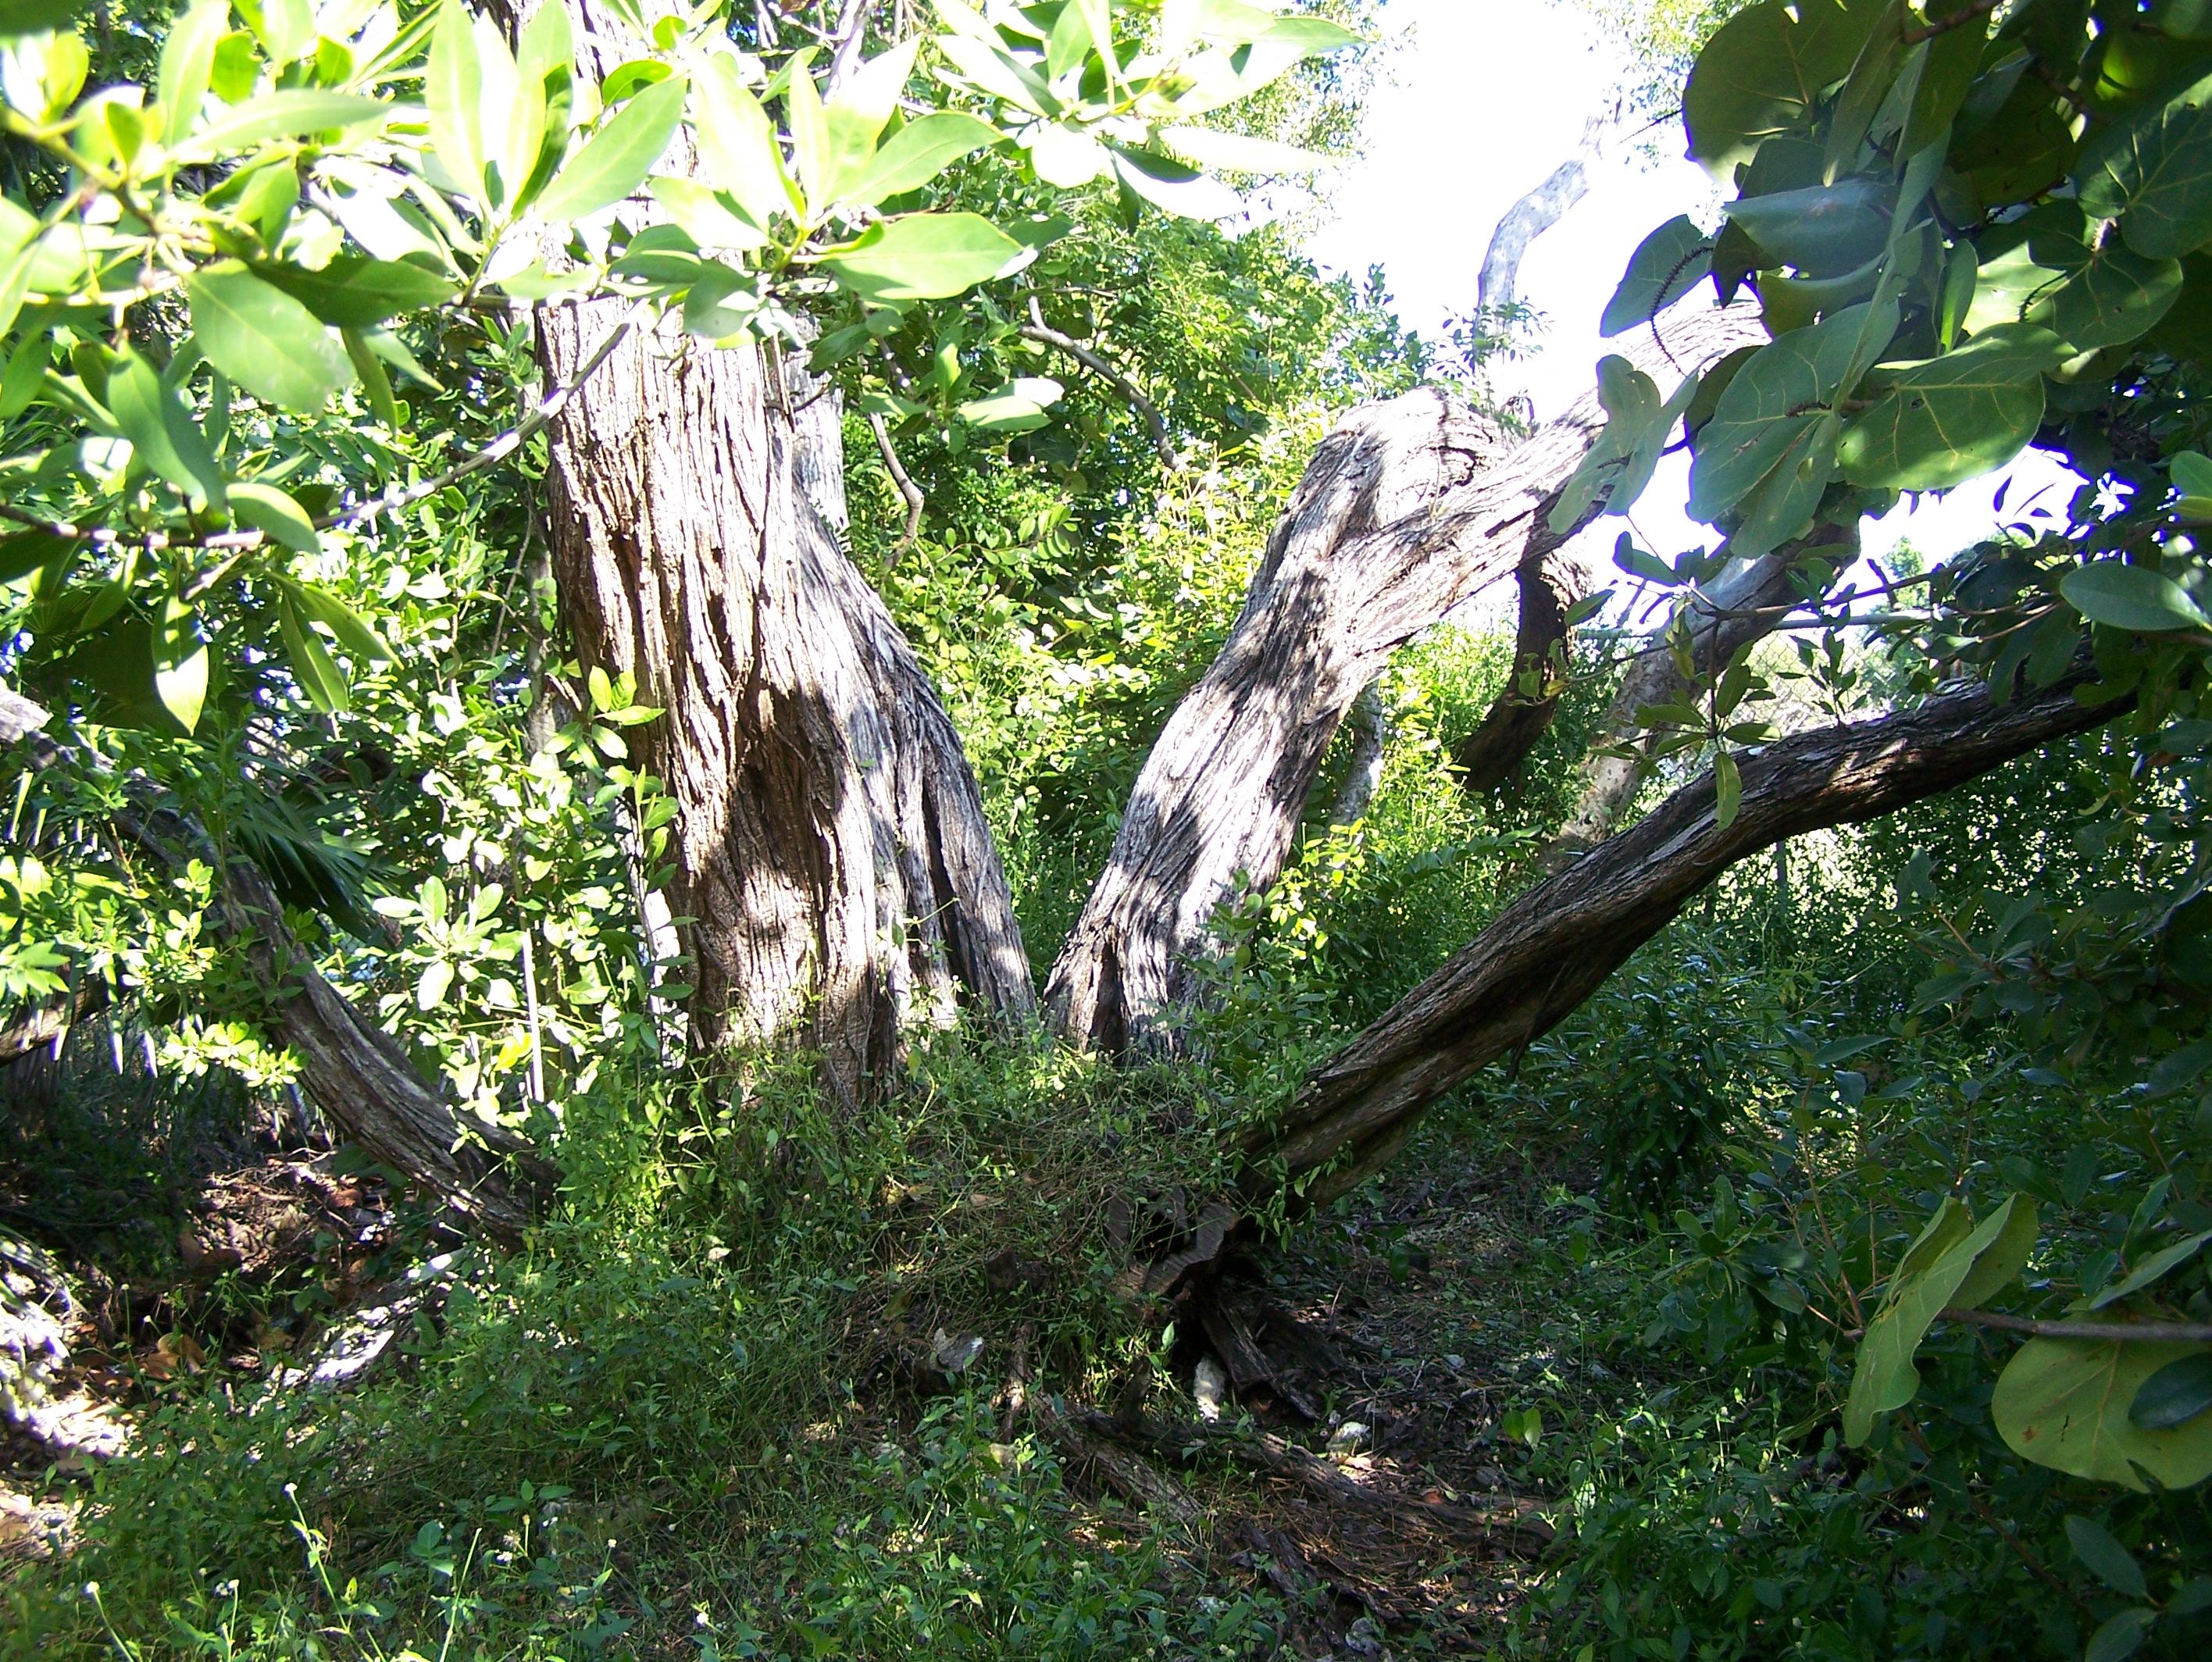 Attirant File:Key West Botanical Gardens